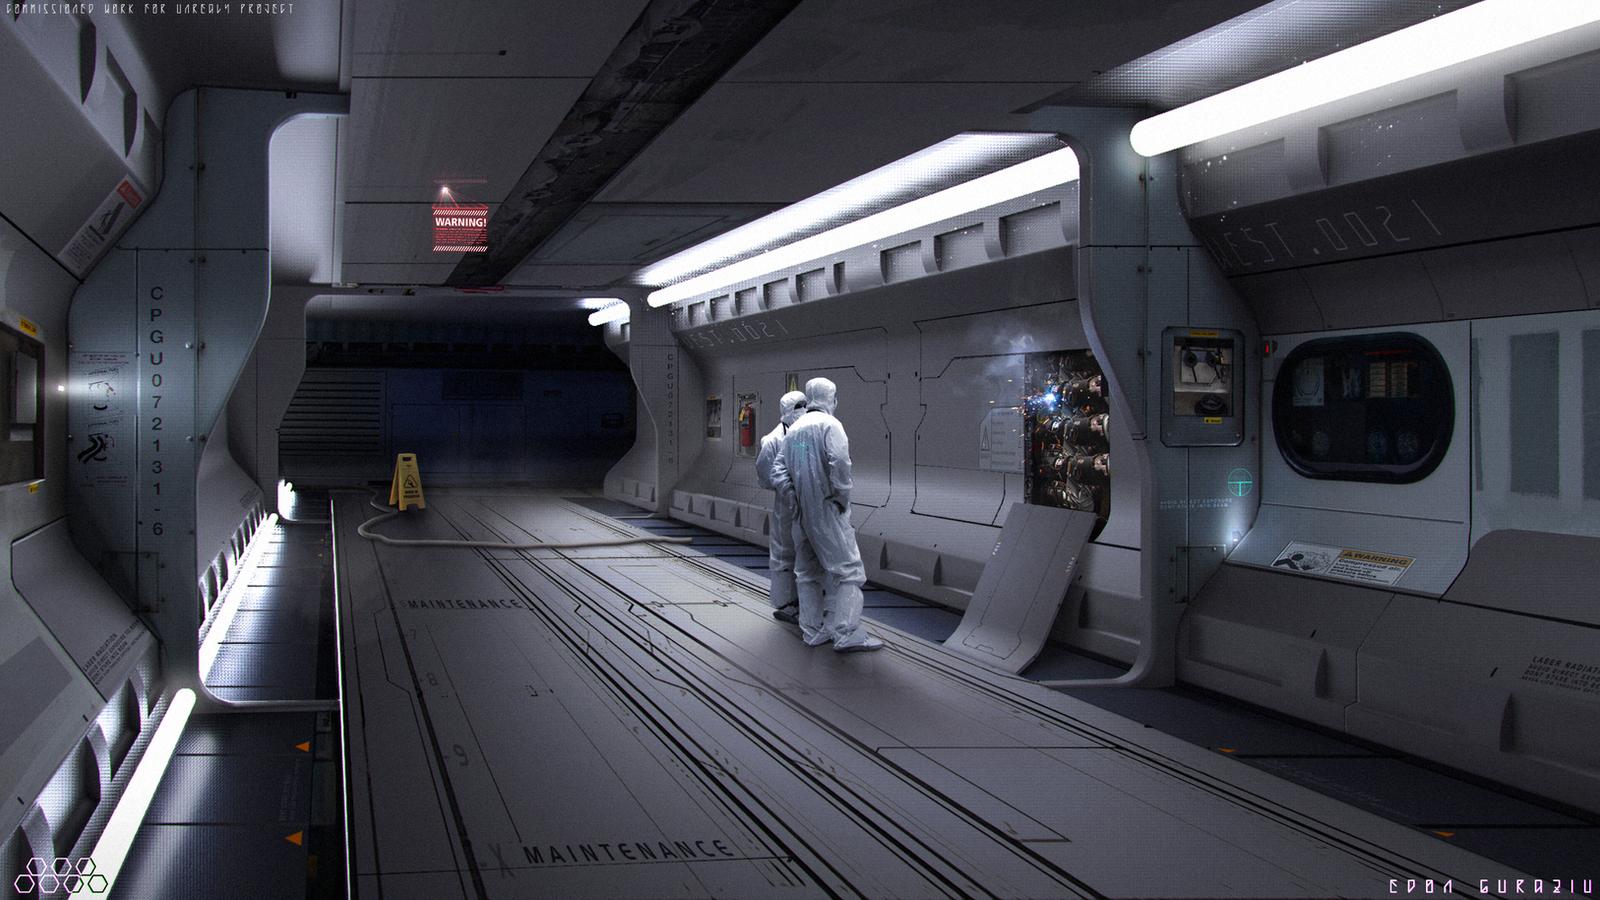 Scifi Corridor Concept By Edonguraziu On Deviantart